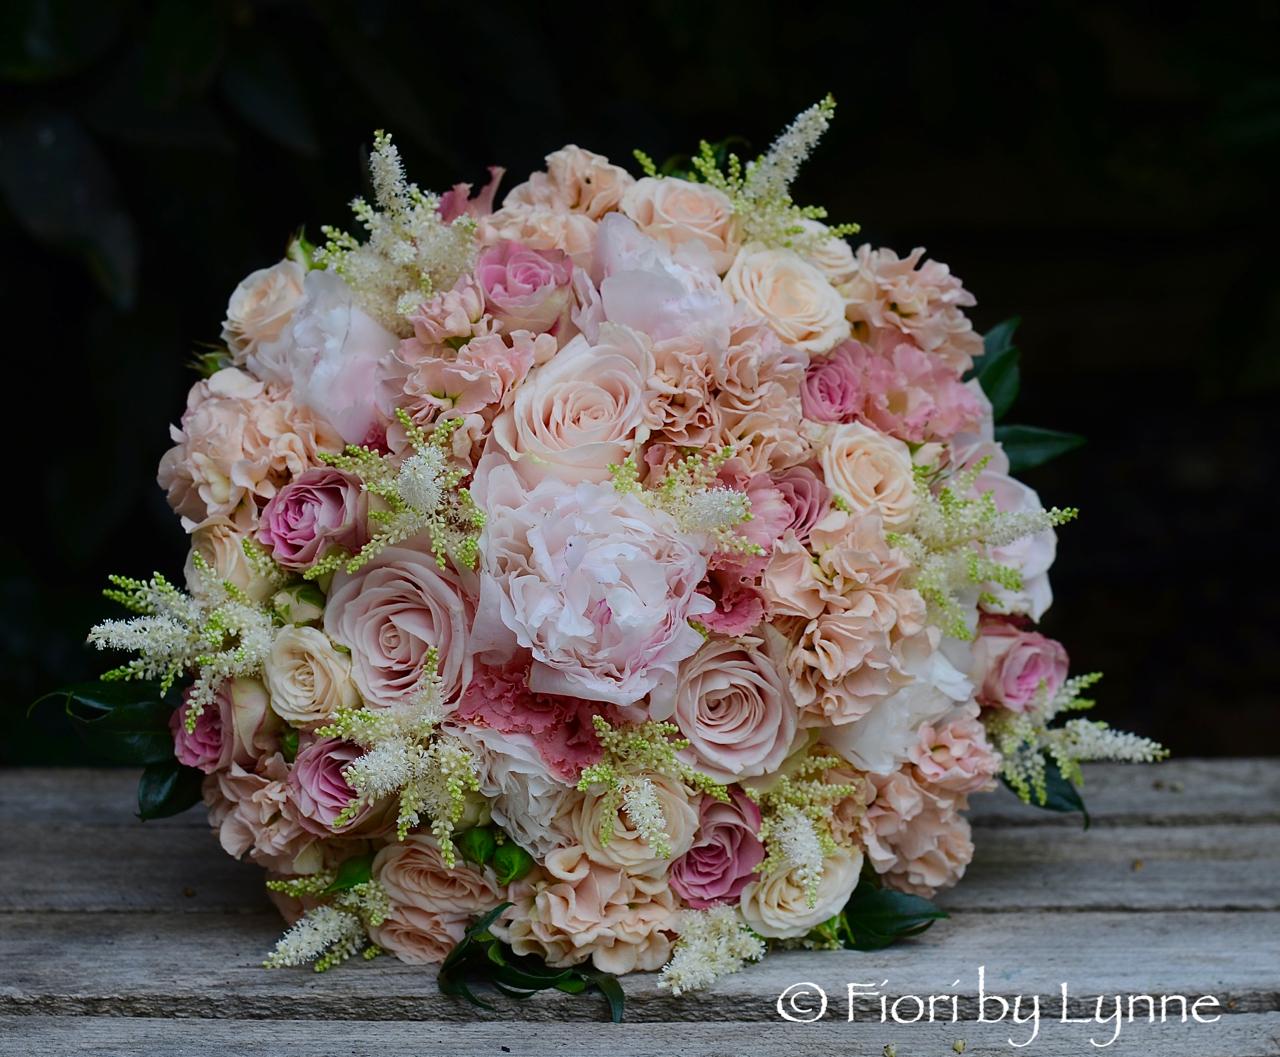 Lisas blush pink apricot and gold wedding flowers old thorns apricotpeachblush pinkbouquetpeonyrosestock mightylinksfo